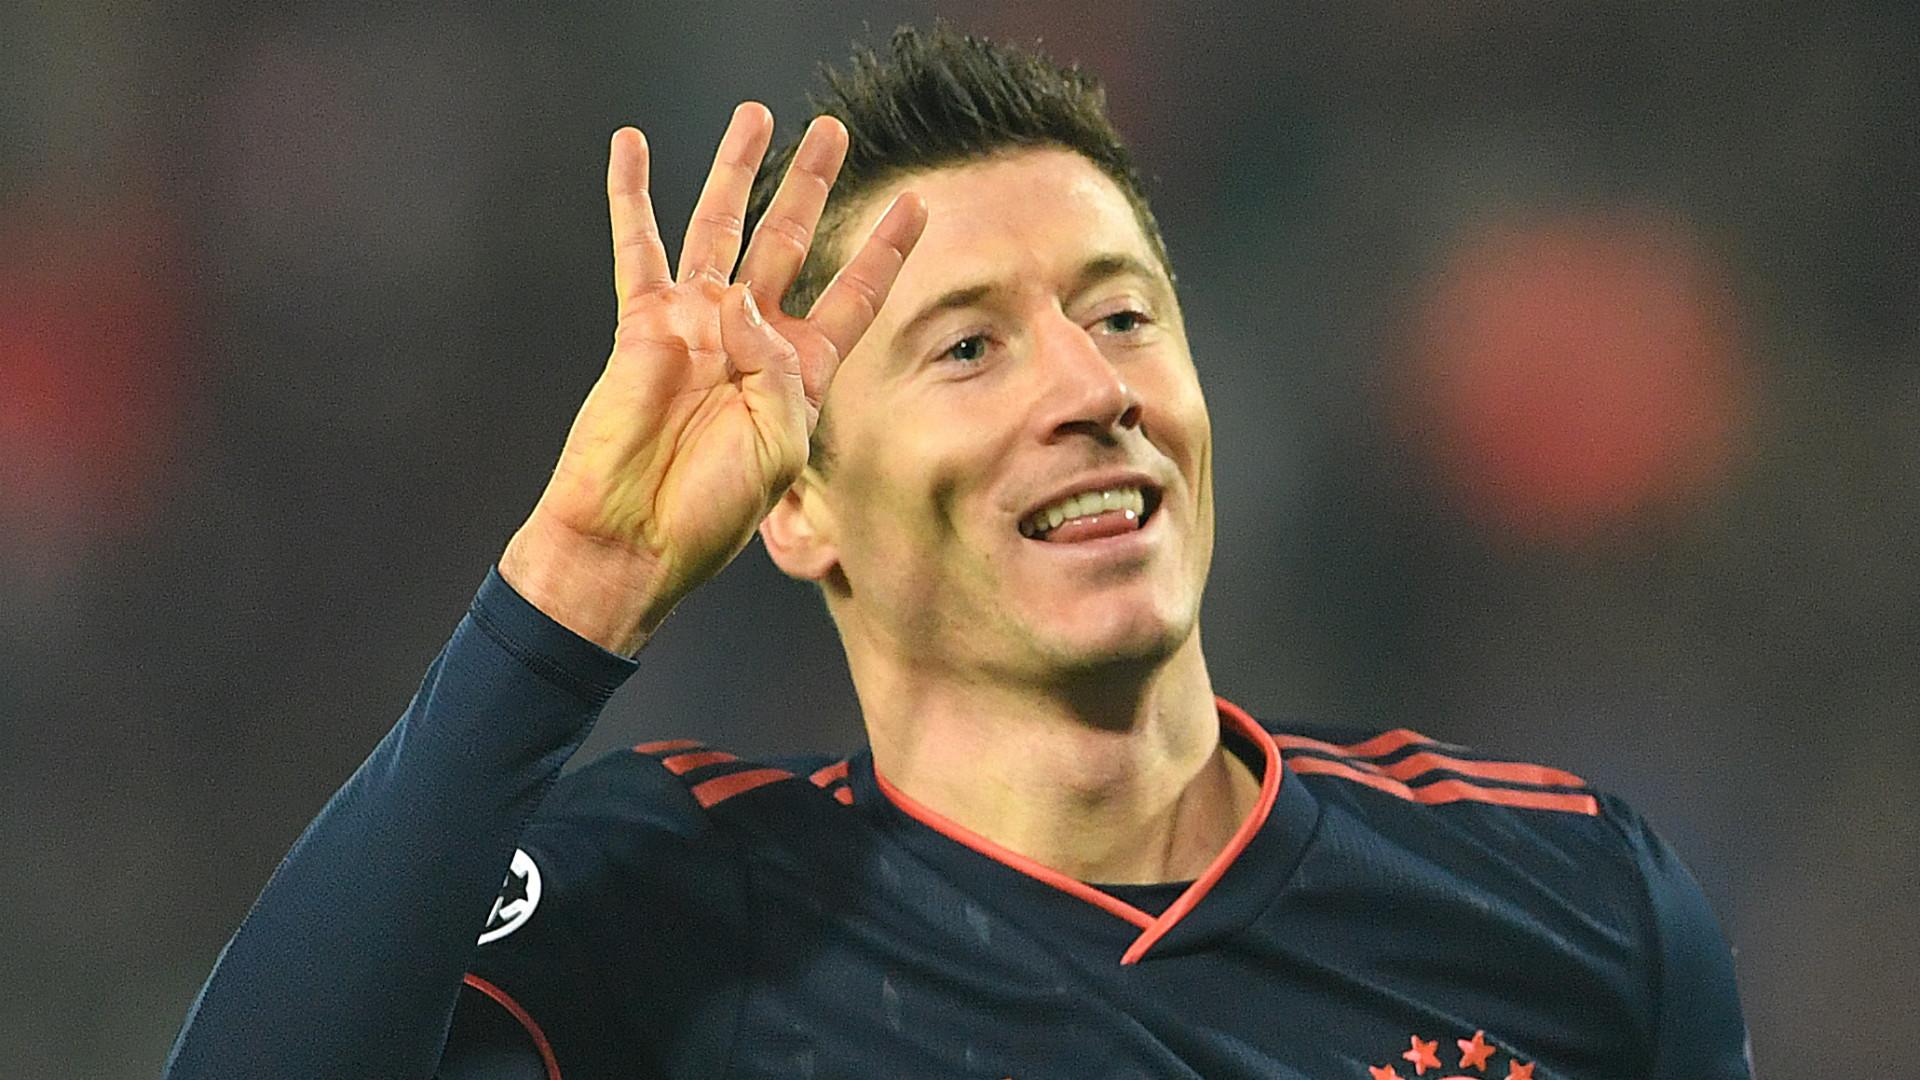 'Haaland can be like Lewandowski, but he's not there yet' – Bayern striker still above Dortmund starlet, says Hitzfeld